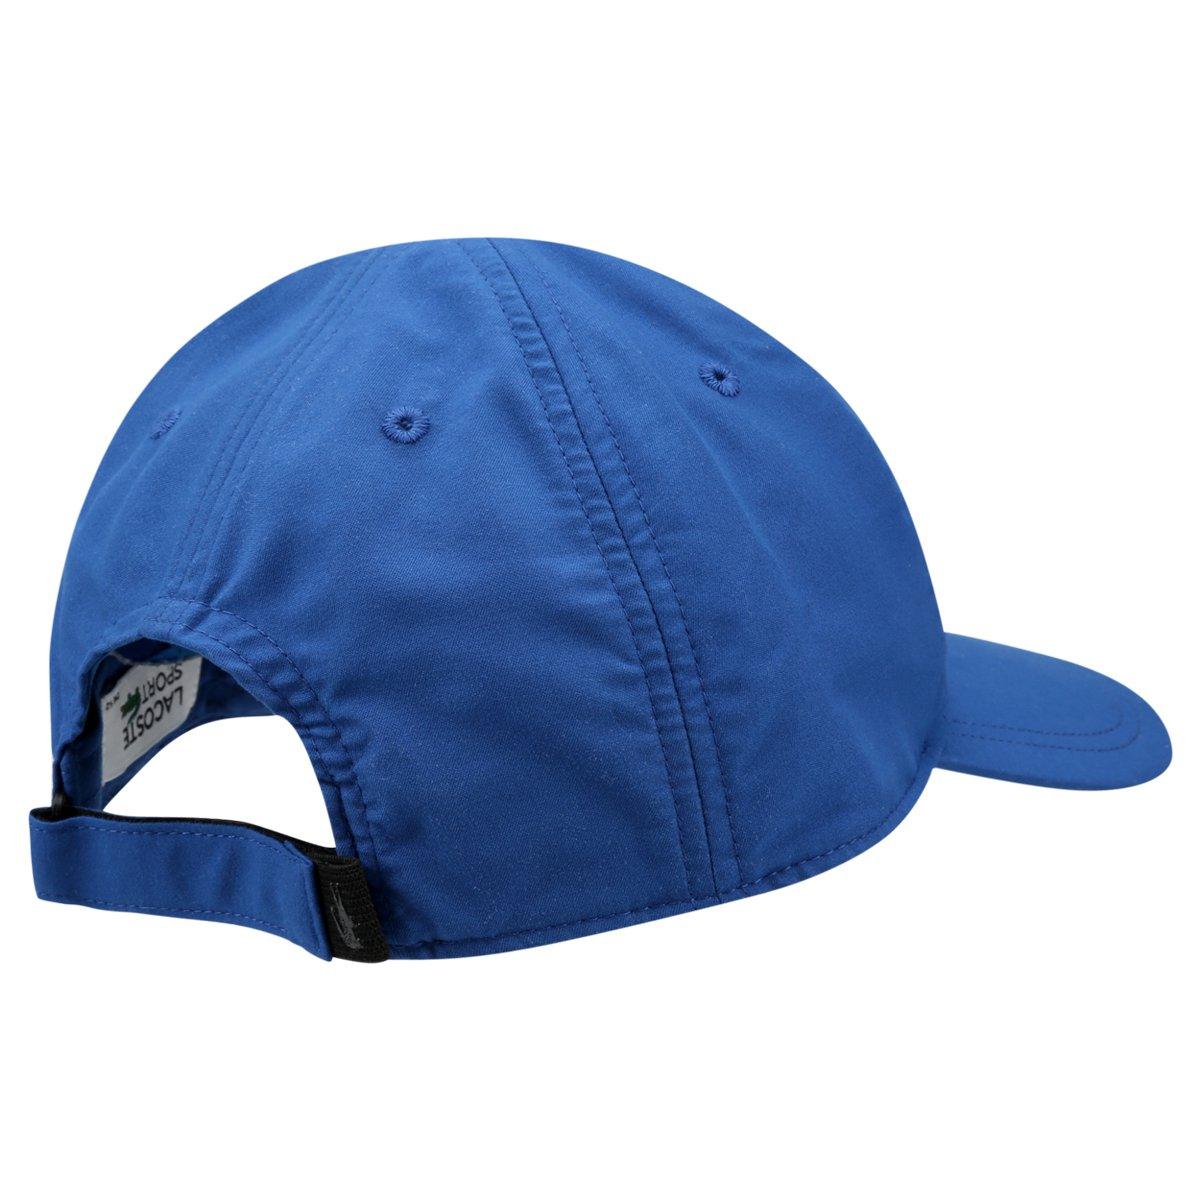 Carregando zoom. b52eb306d47 Boné Lacoste Aba Curva Estampa Logo Masculino  - Azul Royal - Compre . da149fb5d7